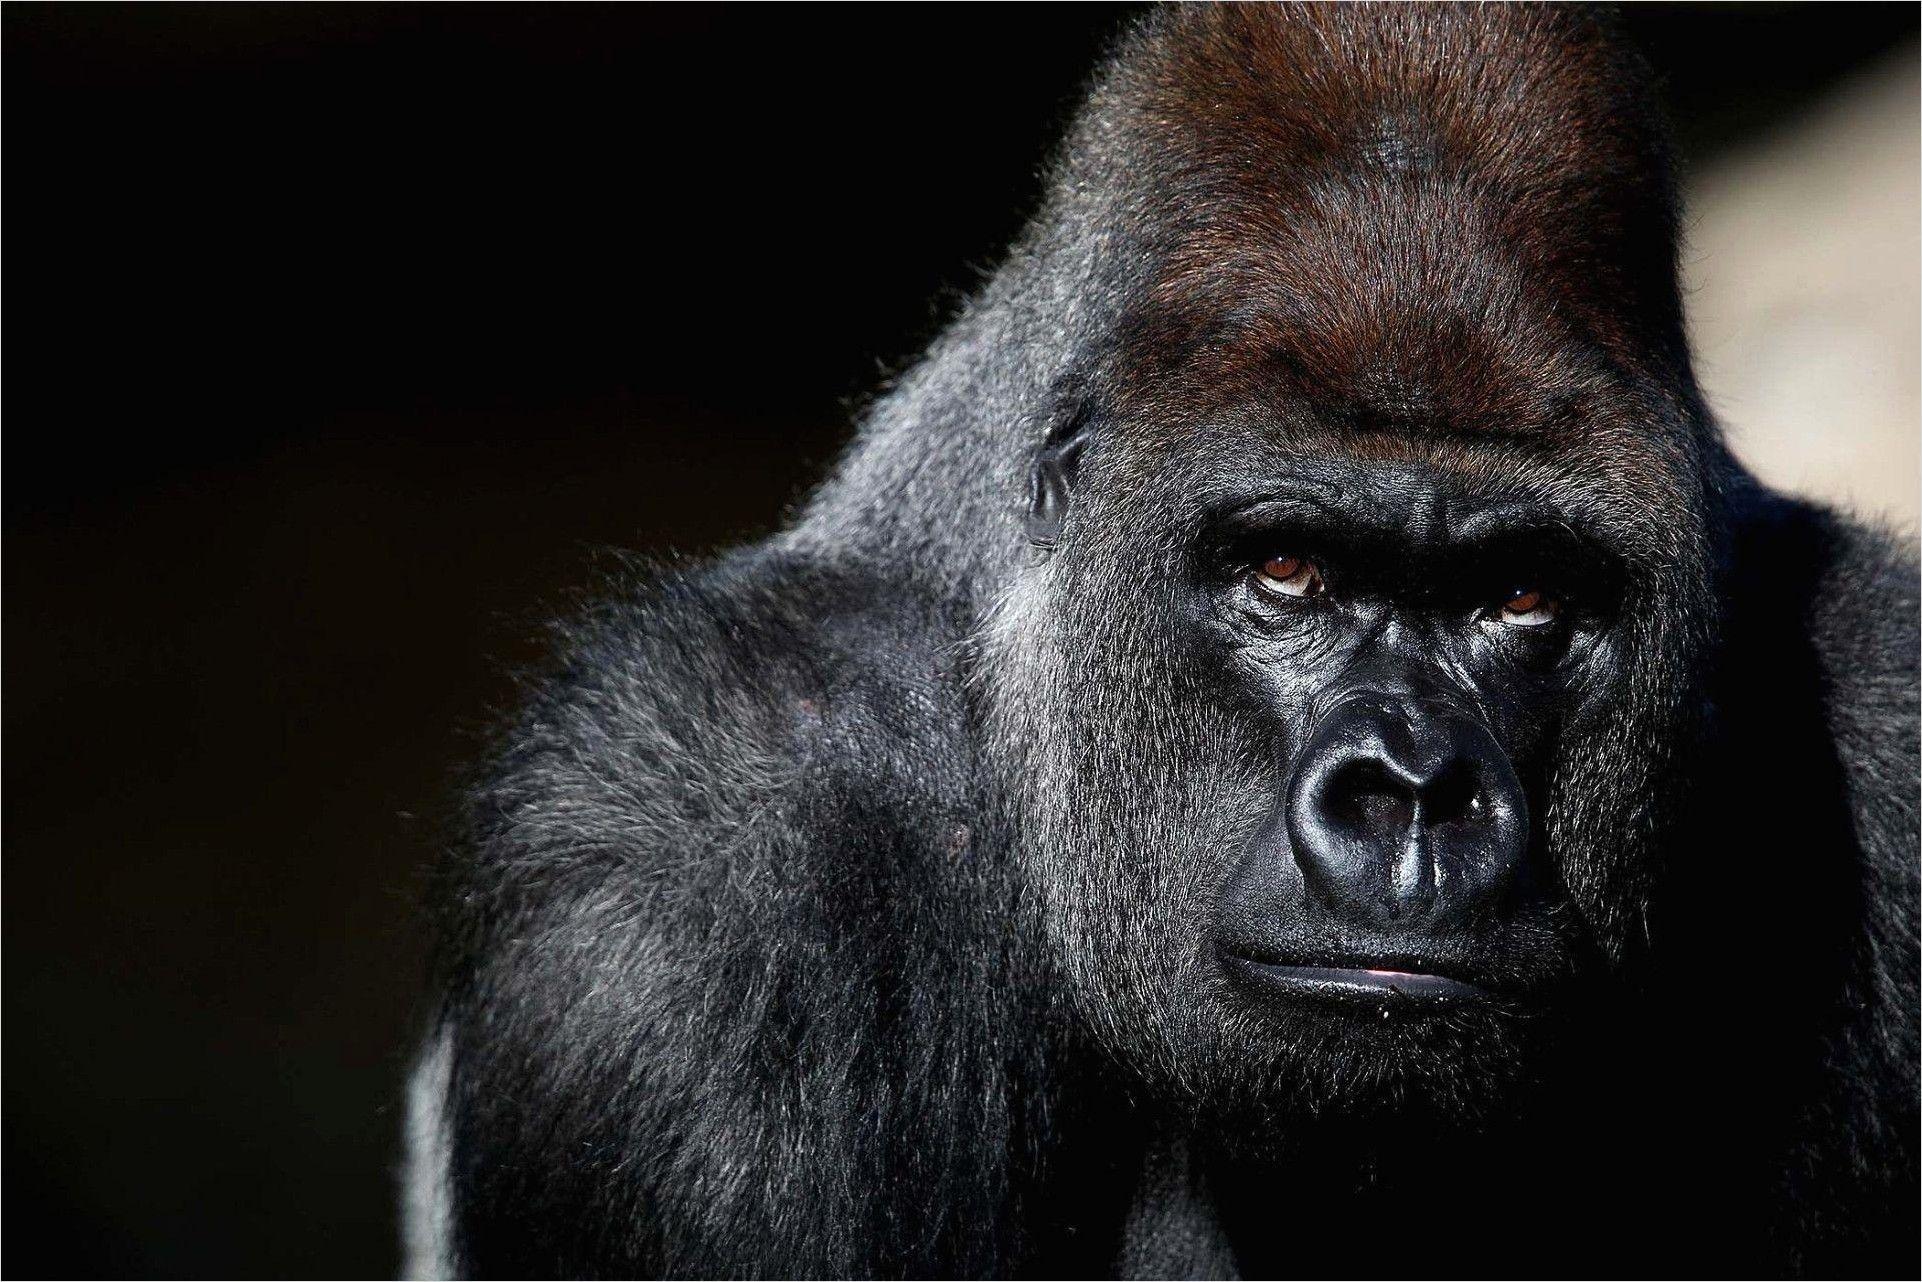 4k Osrs Demonic Gorilla Wallpapers In 2020 Gorilla Wallpaper Gorilla Free Pictures